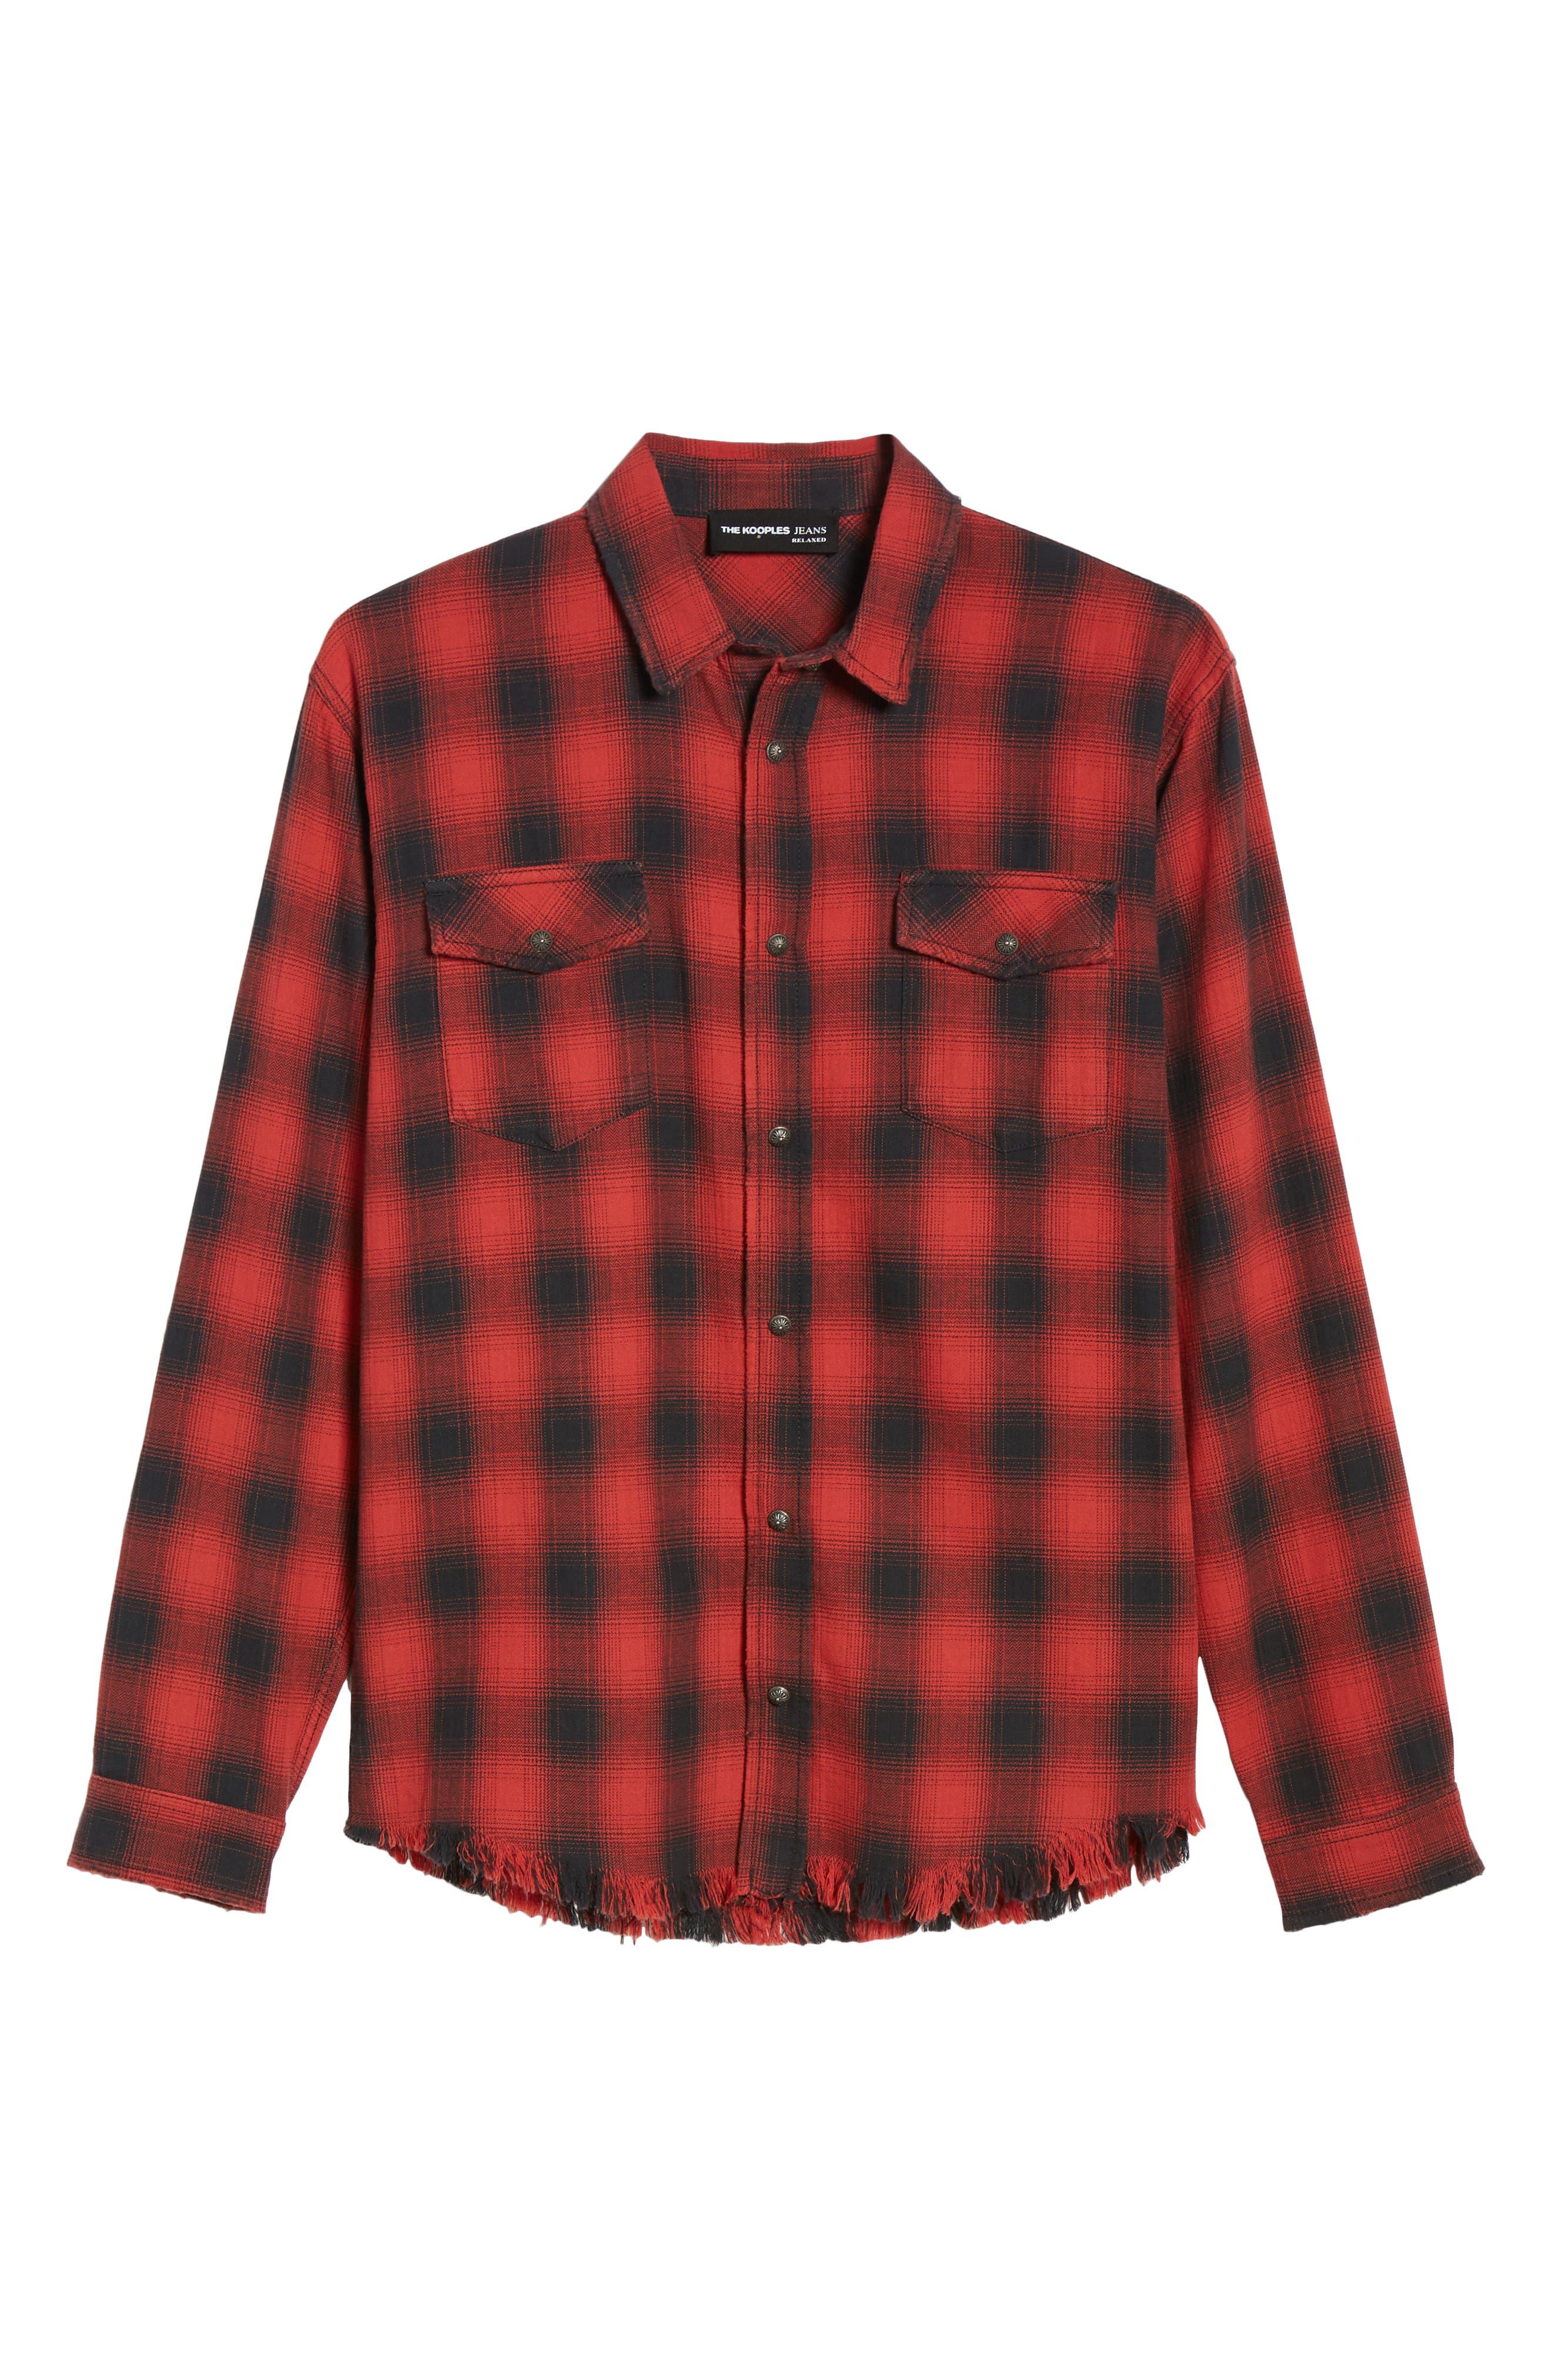 THE KOOPLES, Regular Fit Ombré Plaid Shirt, Alternate thumbnail 5, color, RED / BLACK